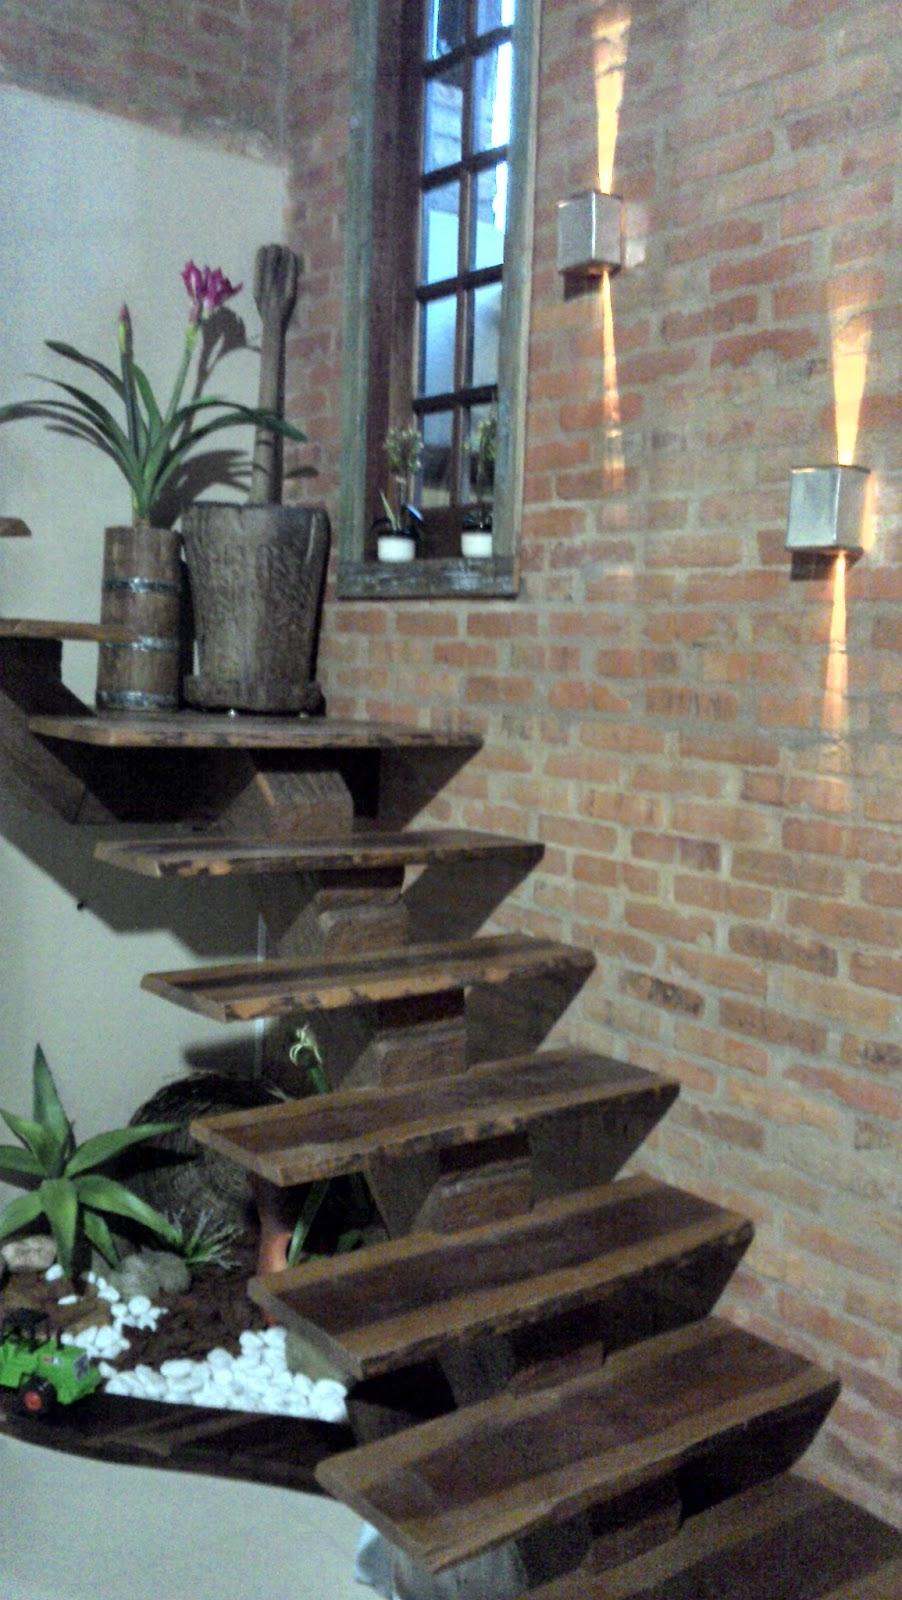 escada jardim madeira : escada jardim madeira:BOUTIQUE DA MADEIRA: Escadas e Pisadas em Madeira Cód.2003